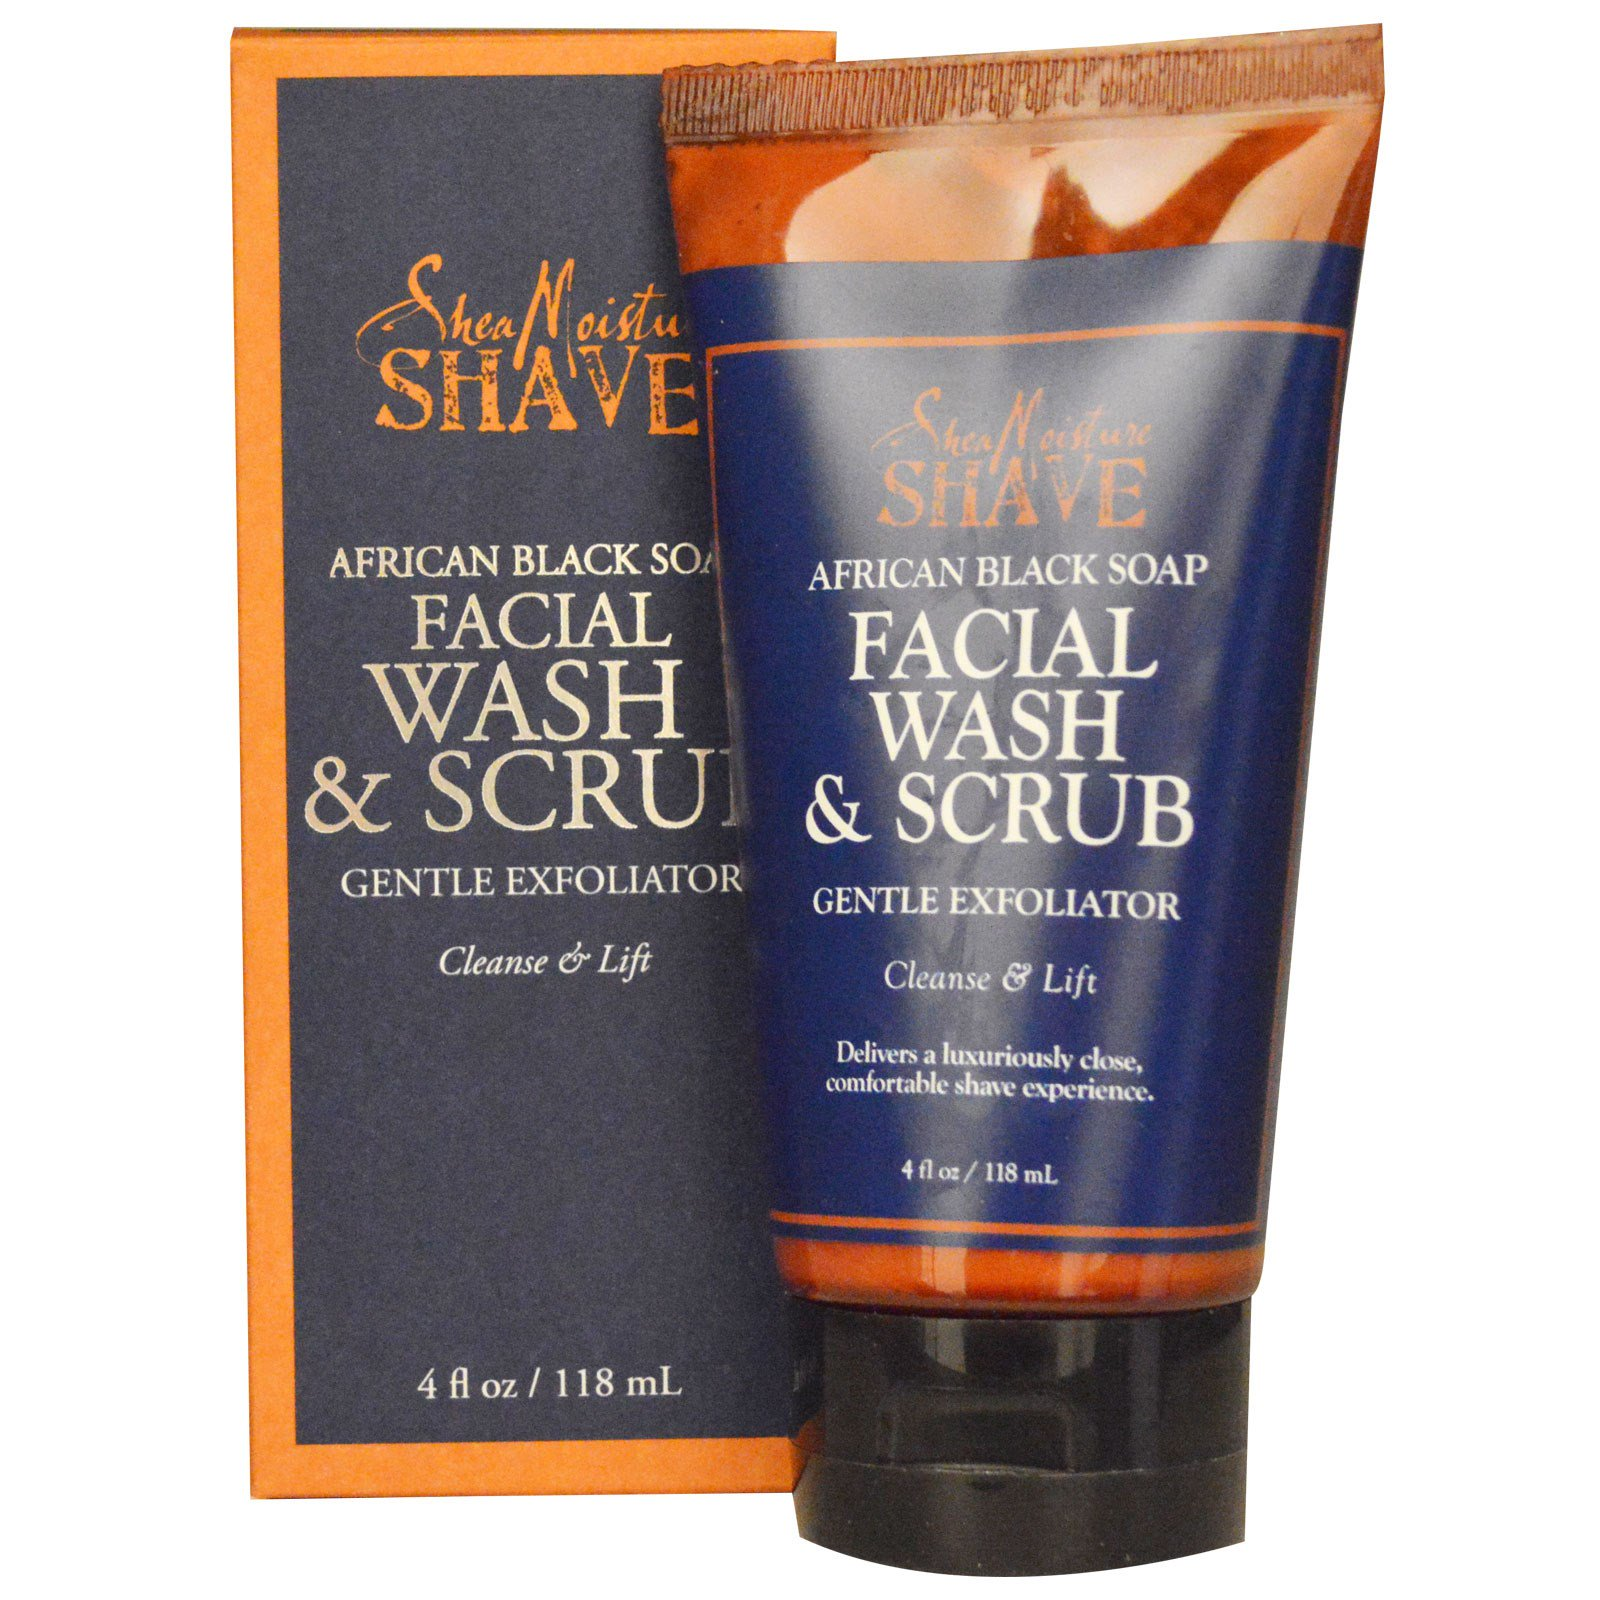 AFRICAN BLACK SOAP FACIAL WASH SCRUB EXFOLIATOR